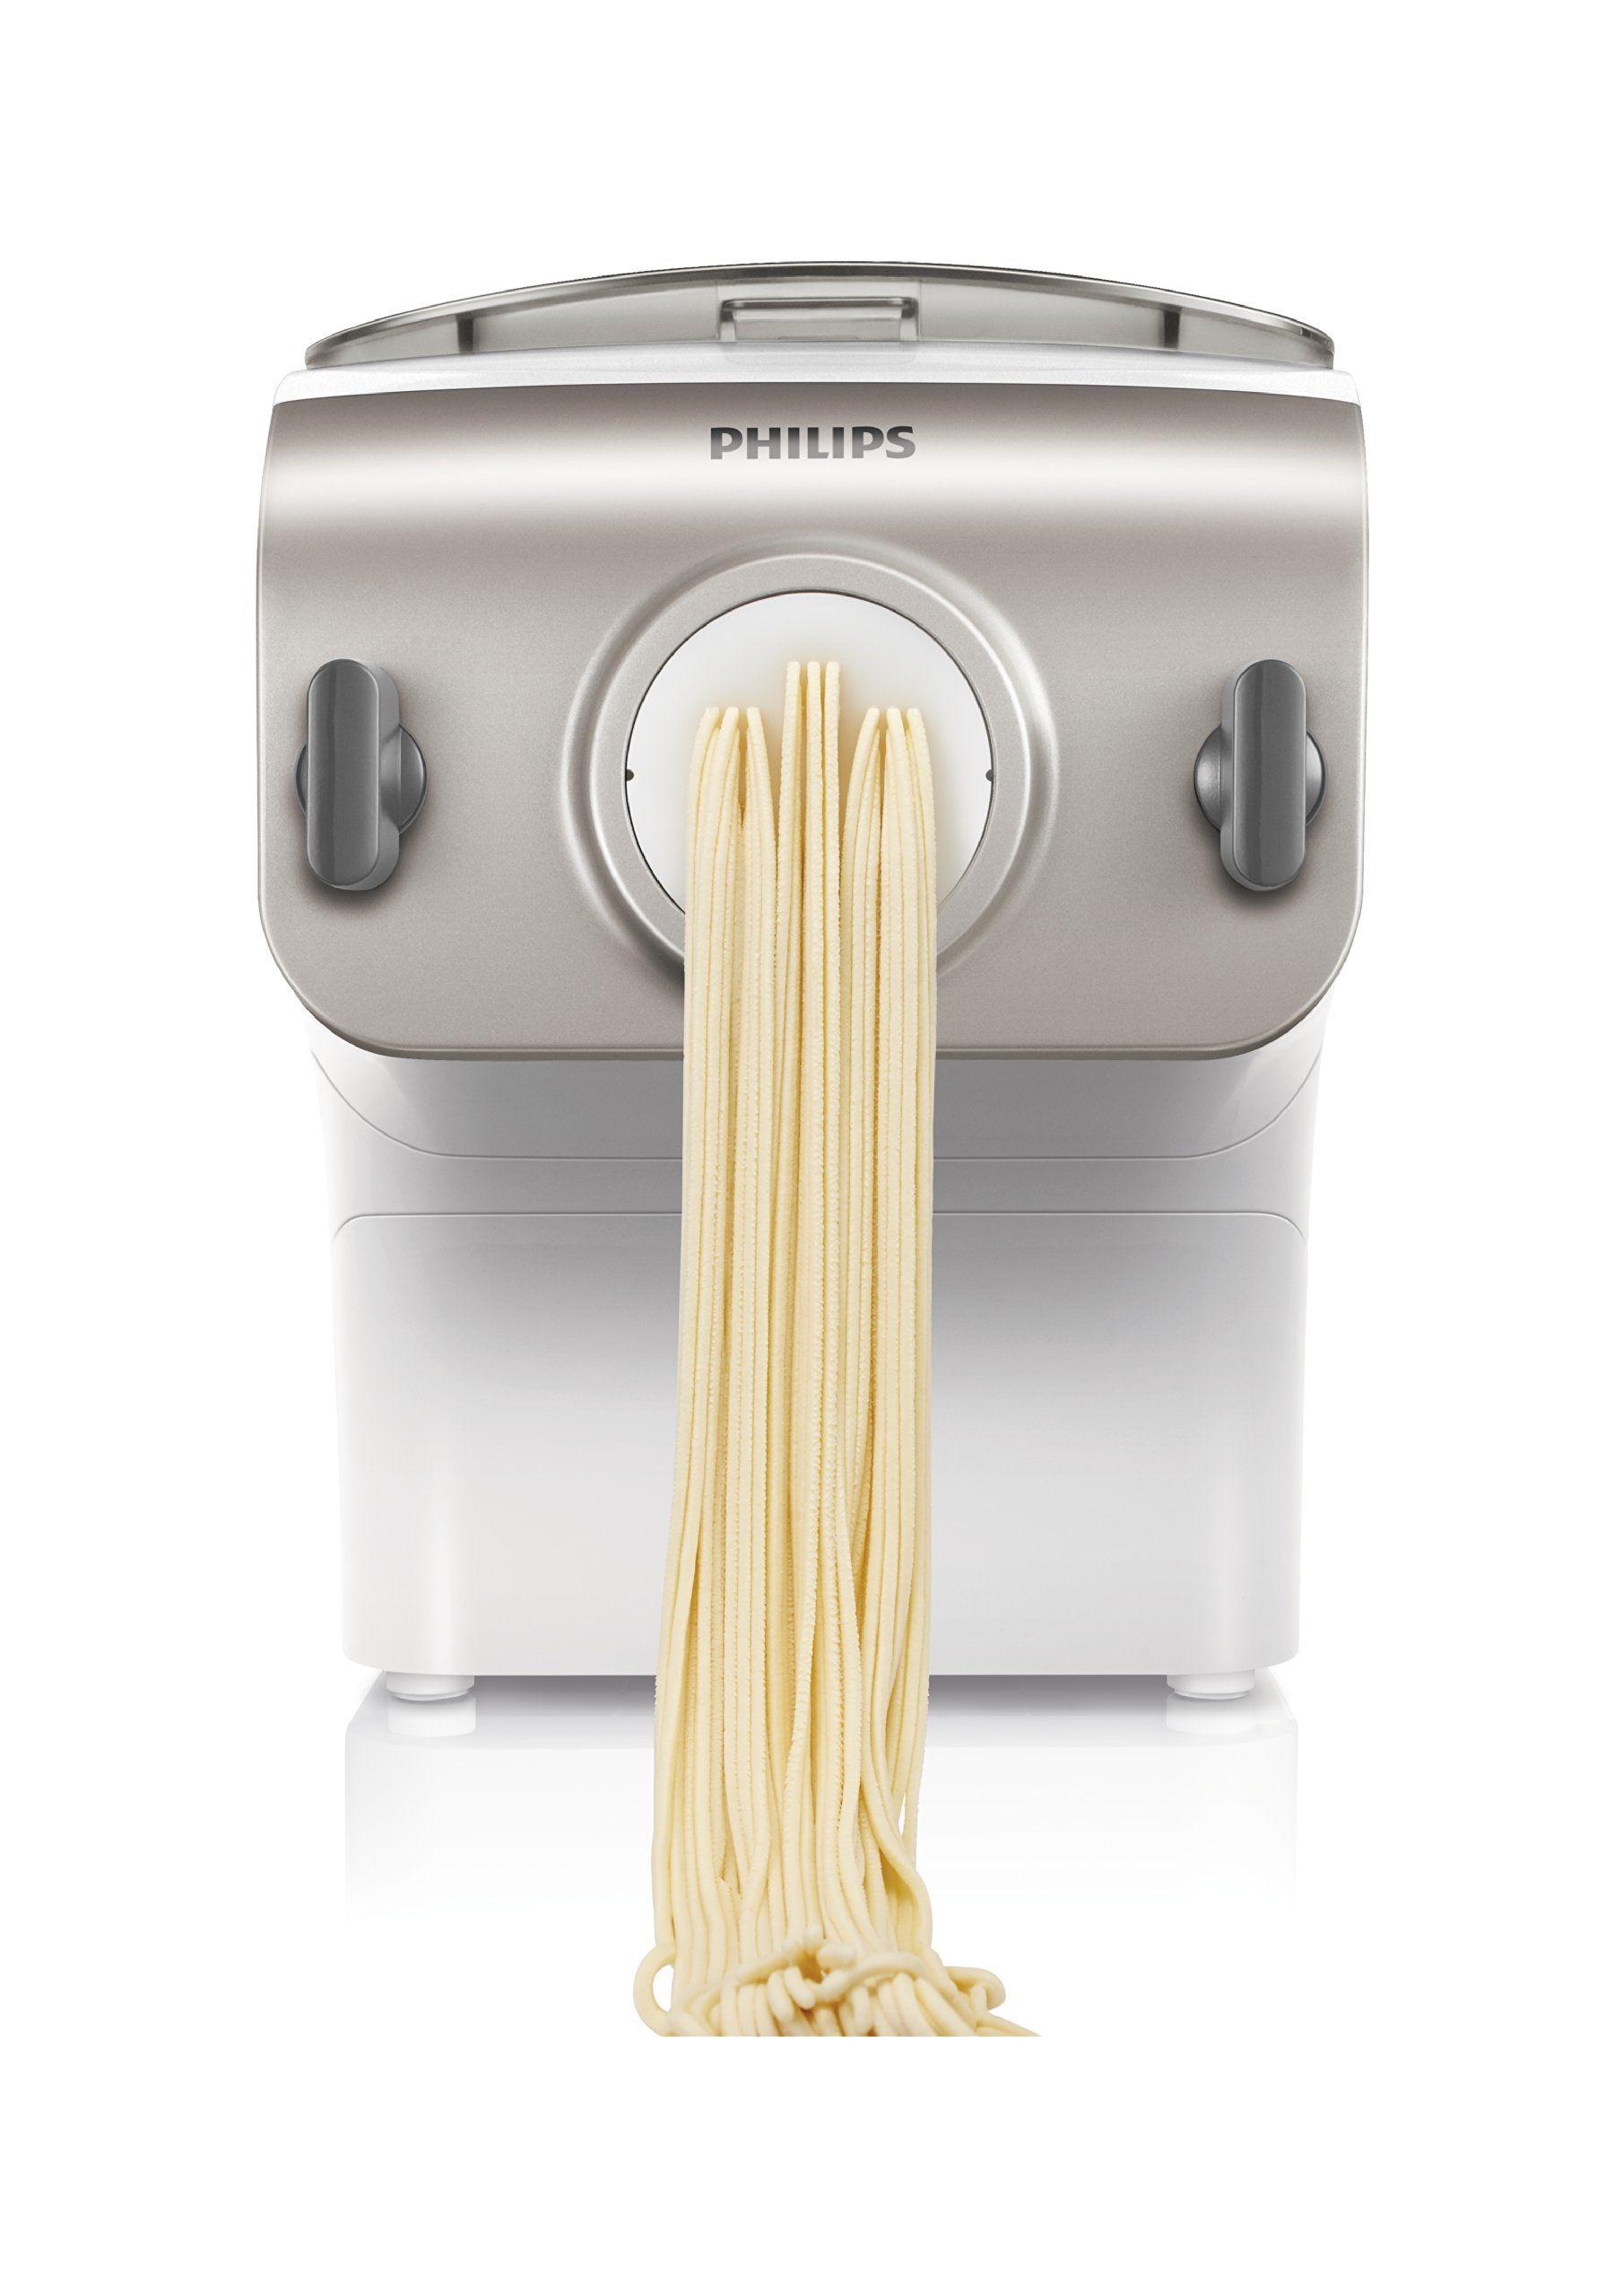 Philipsnoodlesnoodlehr236501 phillips pasta maker